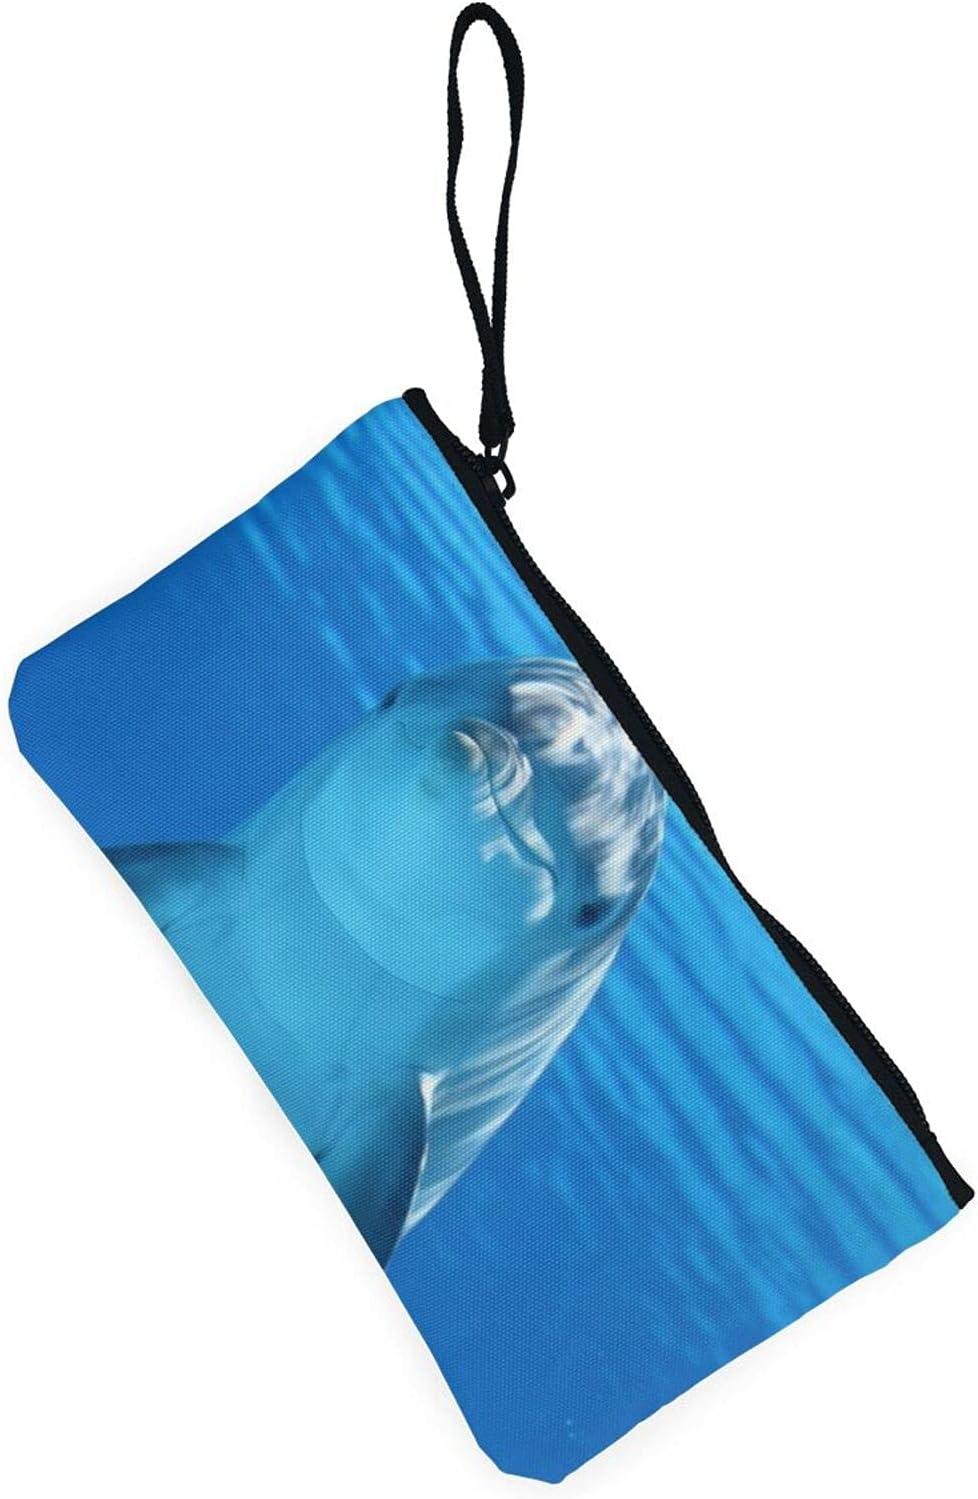 AORRUAM Blue ocean dolphin Canvas Coin Purse,Canvas Zipper Pencil Cases,Canvas Change Purse Pouch Mini Wallet Coin Bag